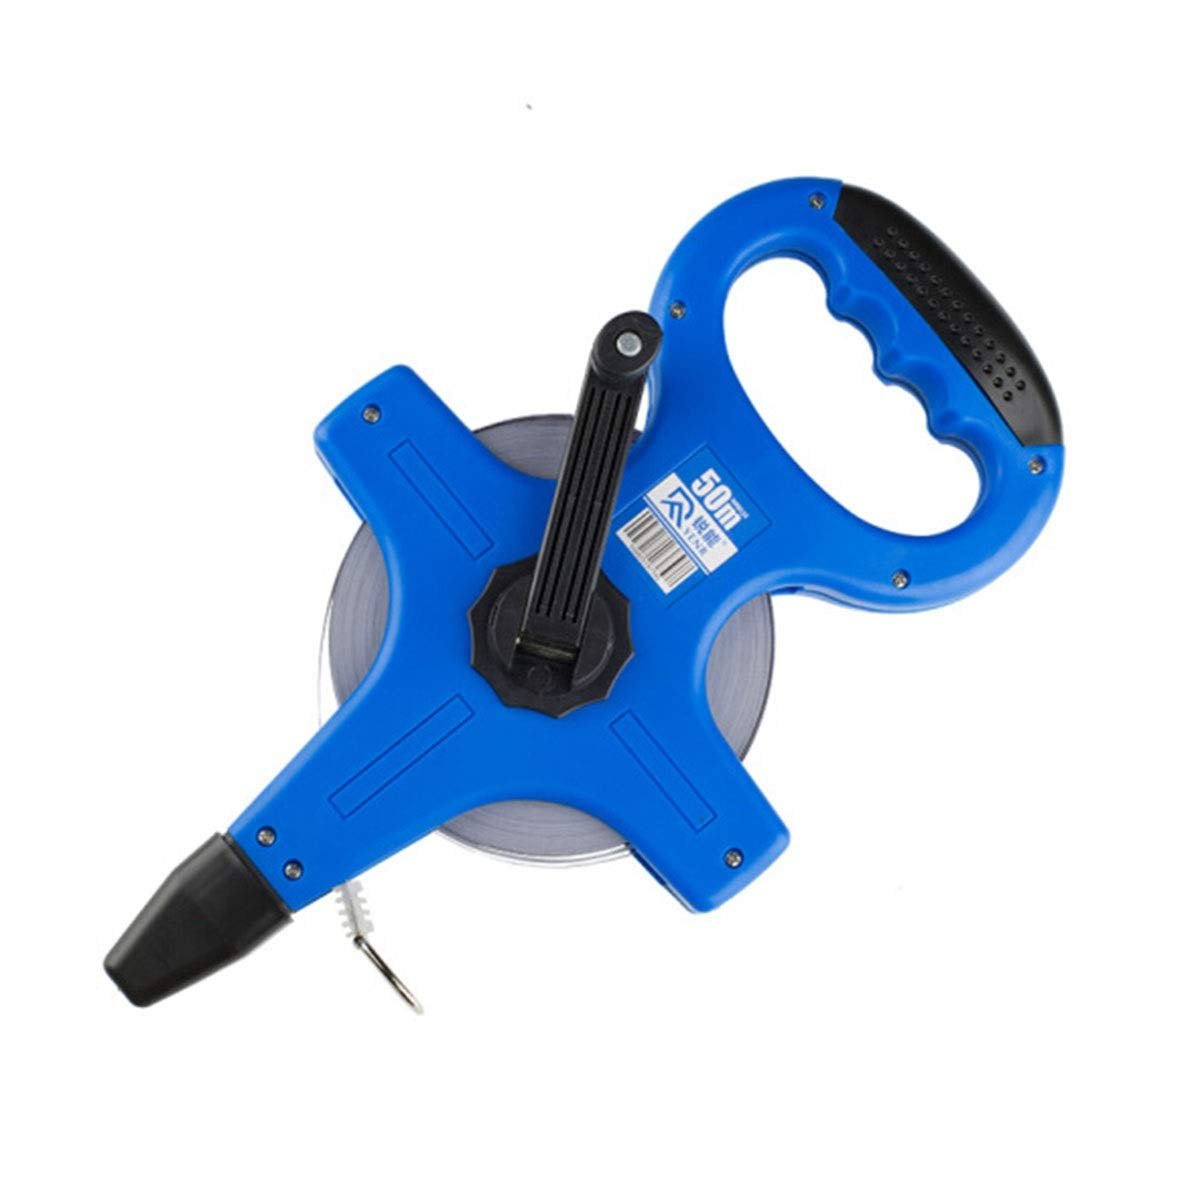 HXSD Steel Tape Measure, Frame Ruler 50m Portable Frame Steel Tape Measure, Long Tape Measure, Engineering Ruler Ruler Ruler Meter Ruler Decoration Measuring Ruler, 50M (Color : Blue, Size : 50m) by HXSD